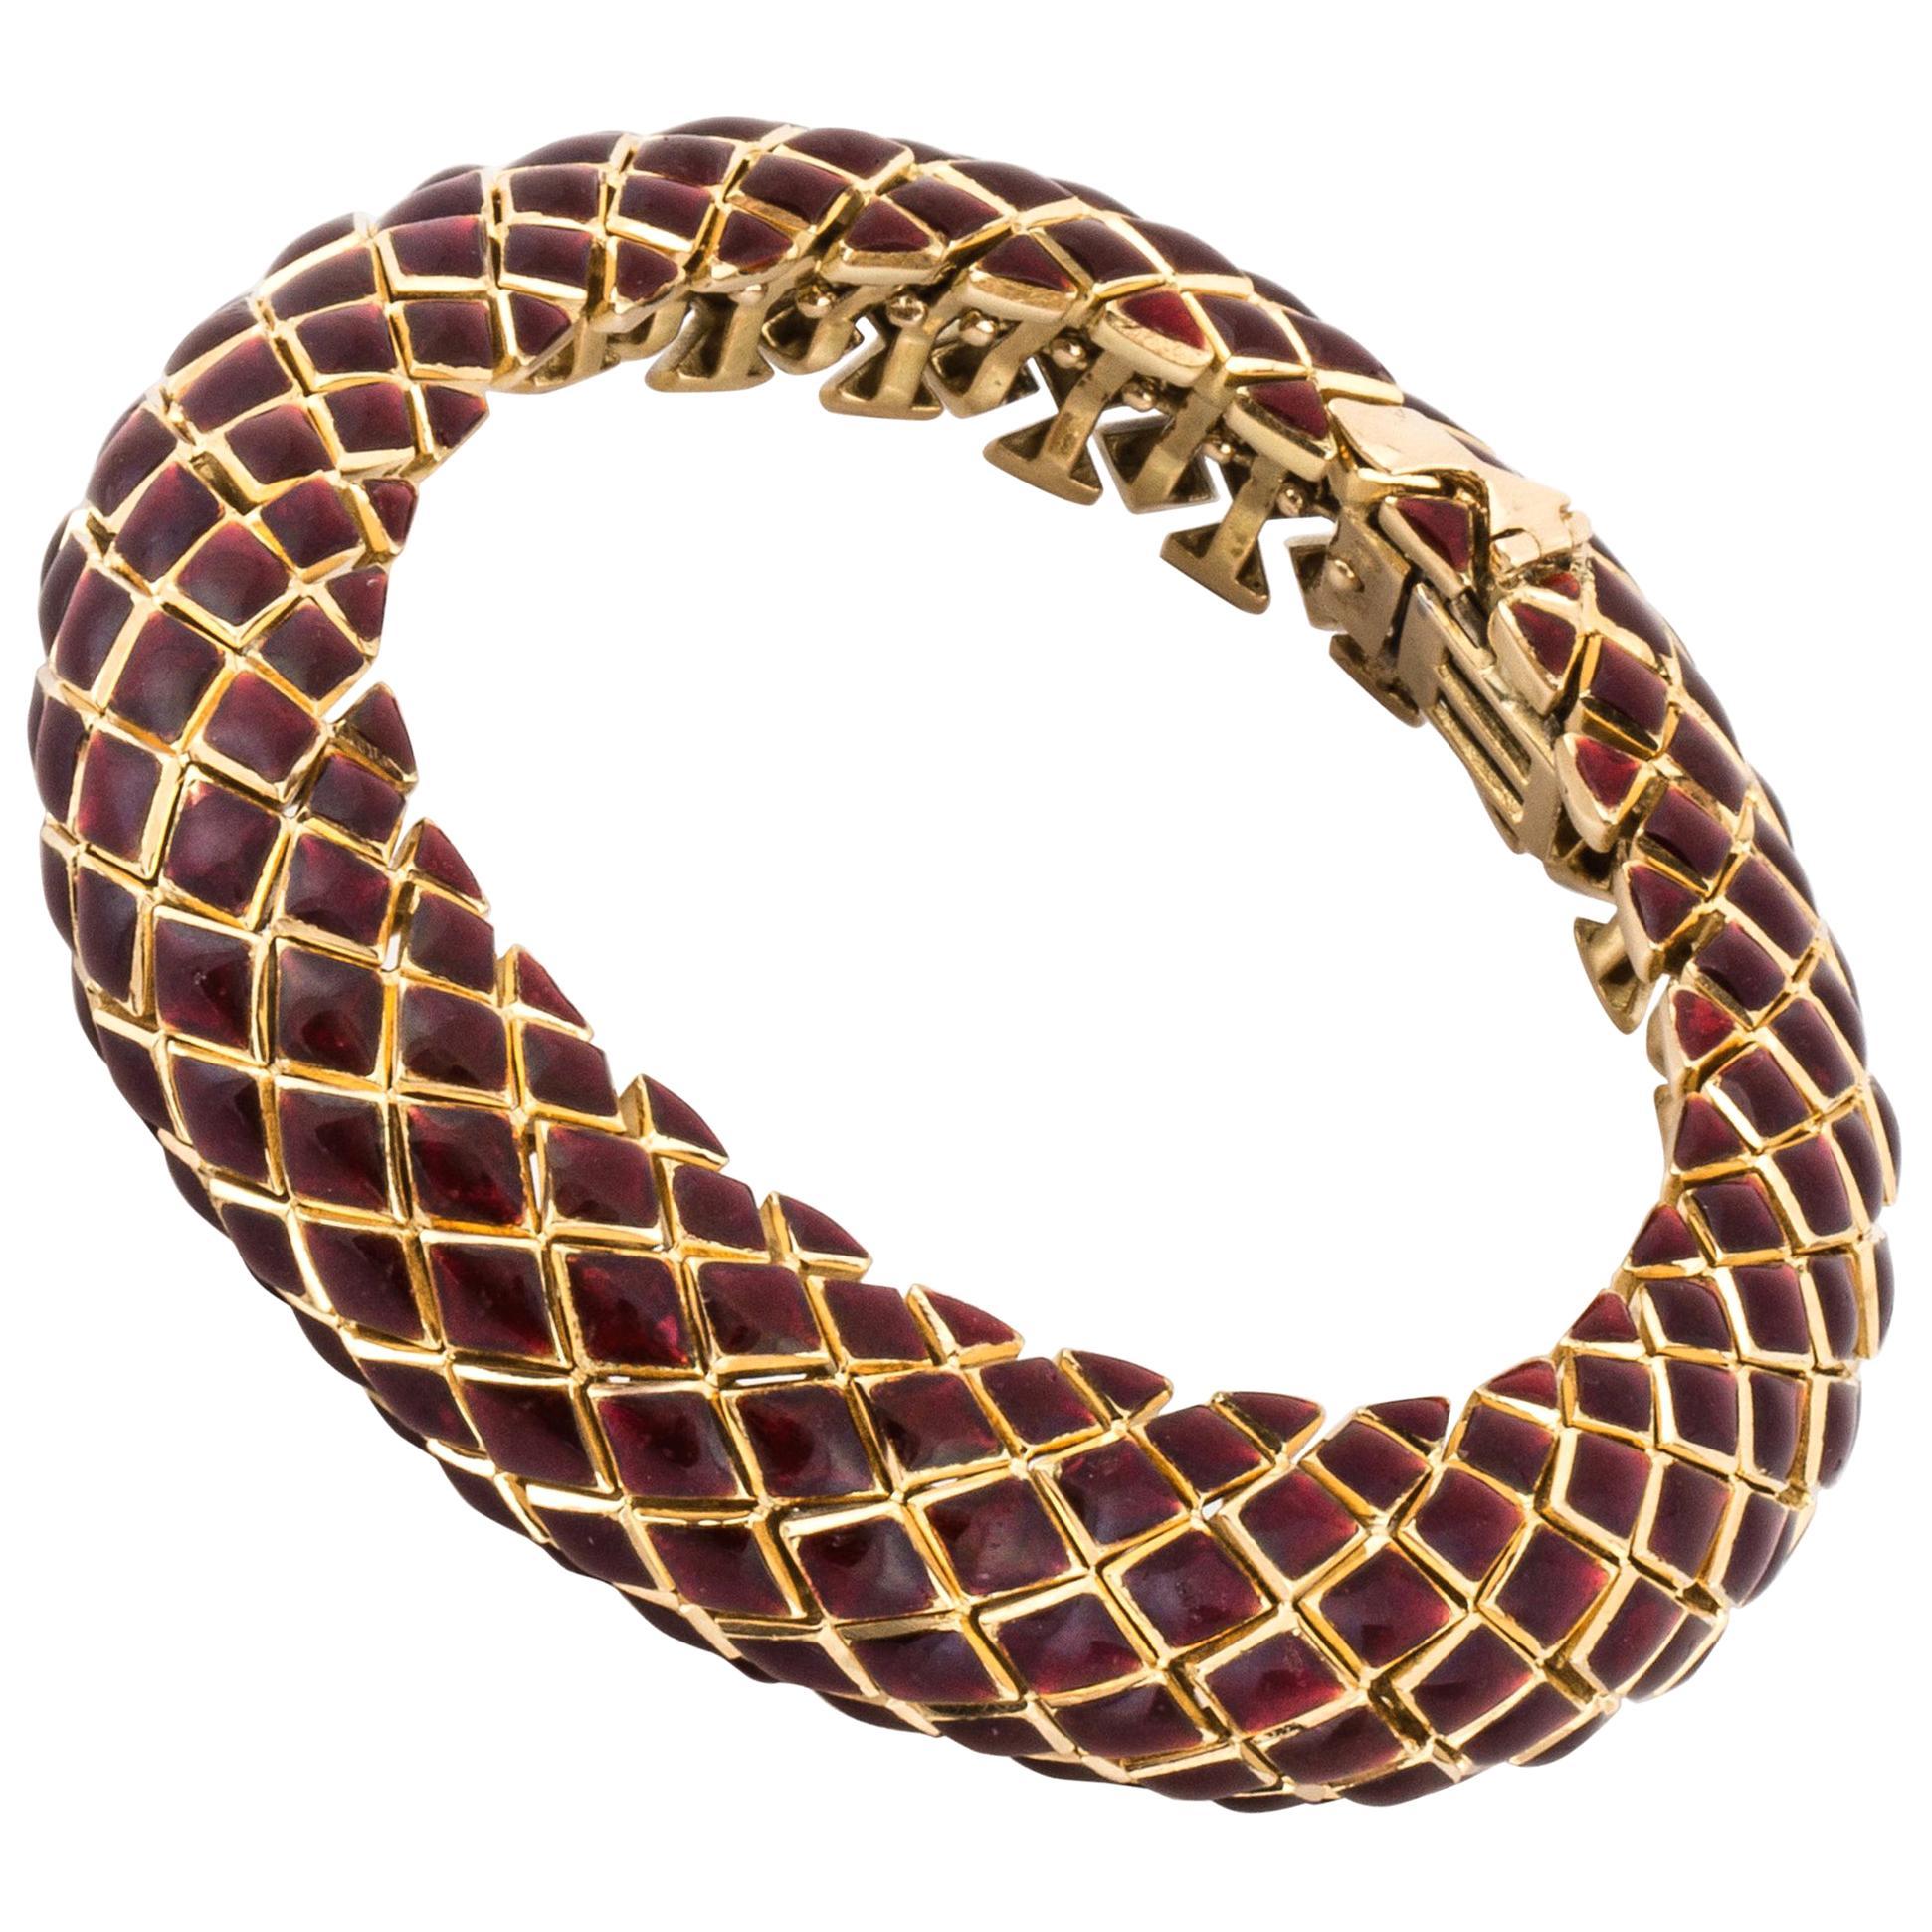 David Webb 18K Yellow Gold Red Enamel Bracelet